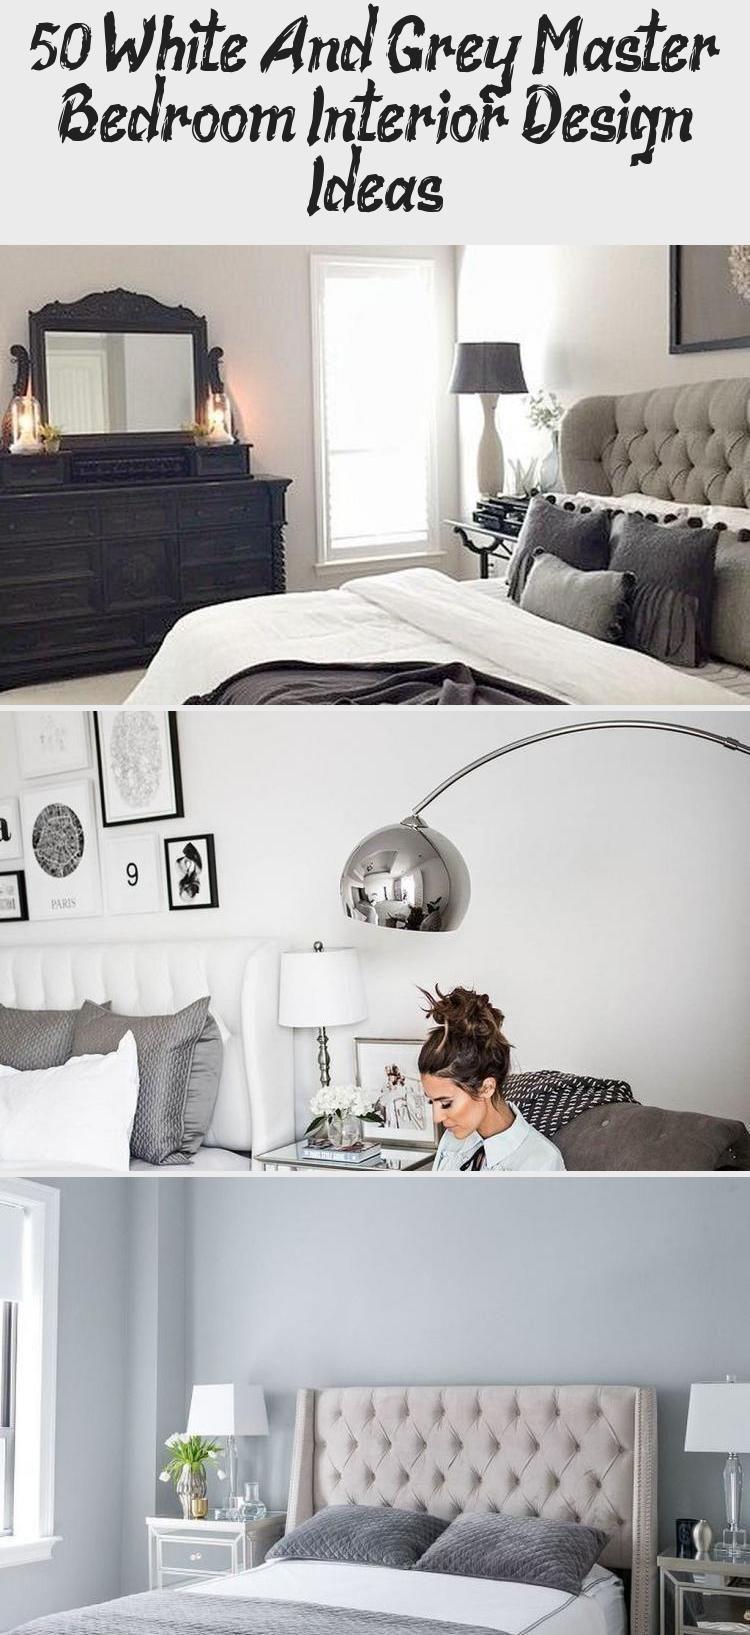 50+ White And Grey Master Bedroom Interior Design Ideas - Galafashion, Street St...#bedroom #design #galafashion #grey #ideas #interior #master #street #white